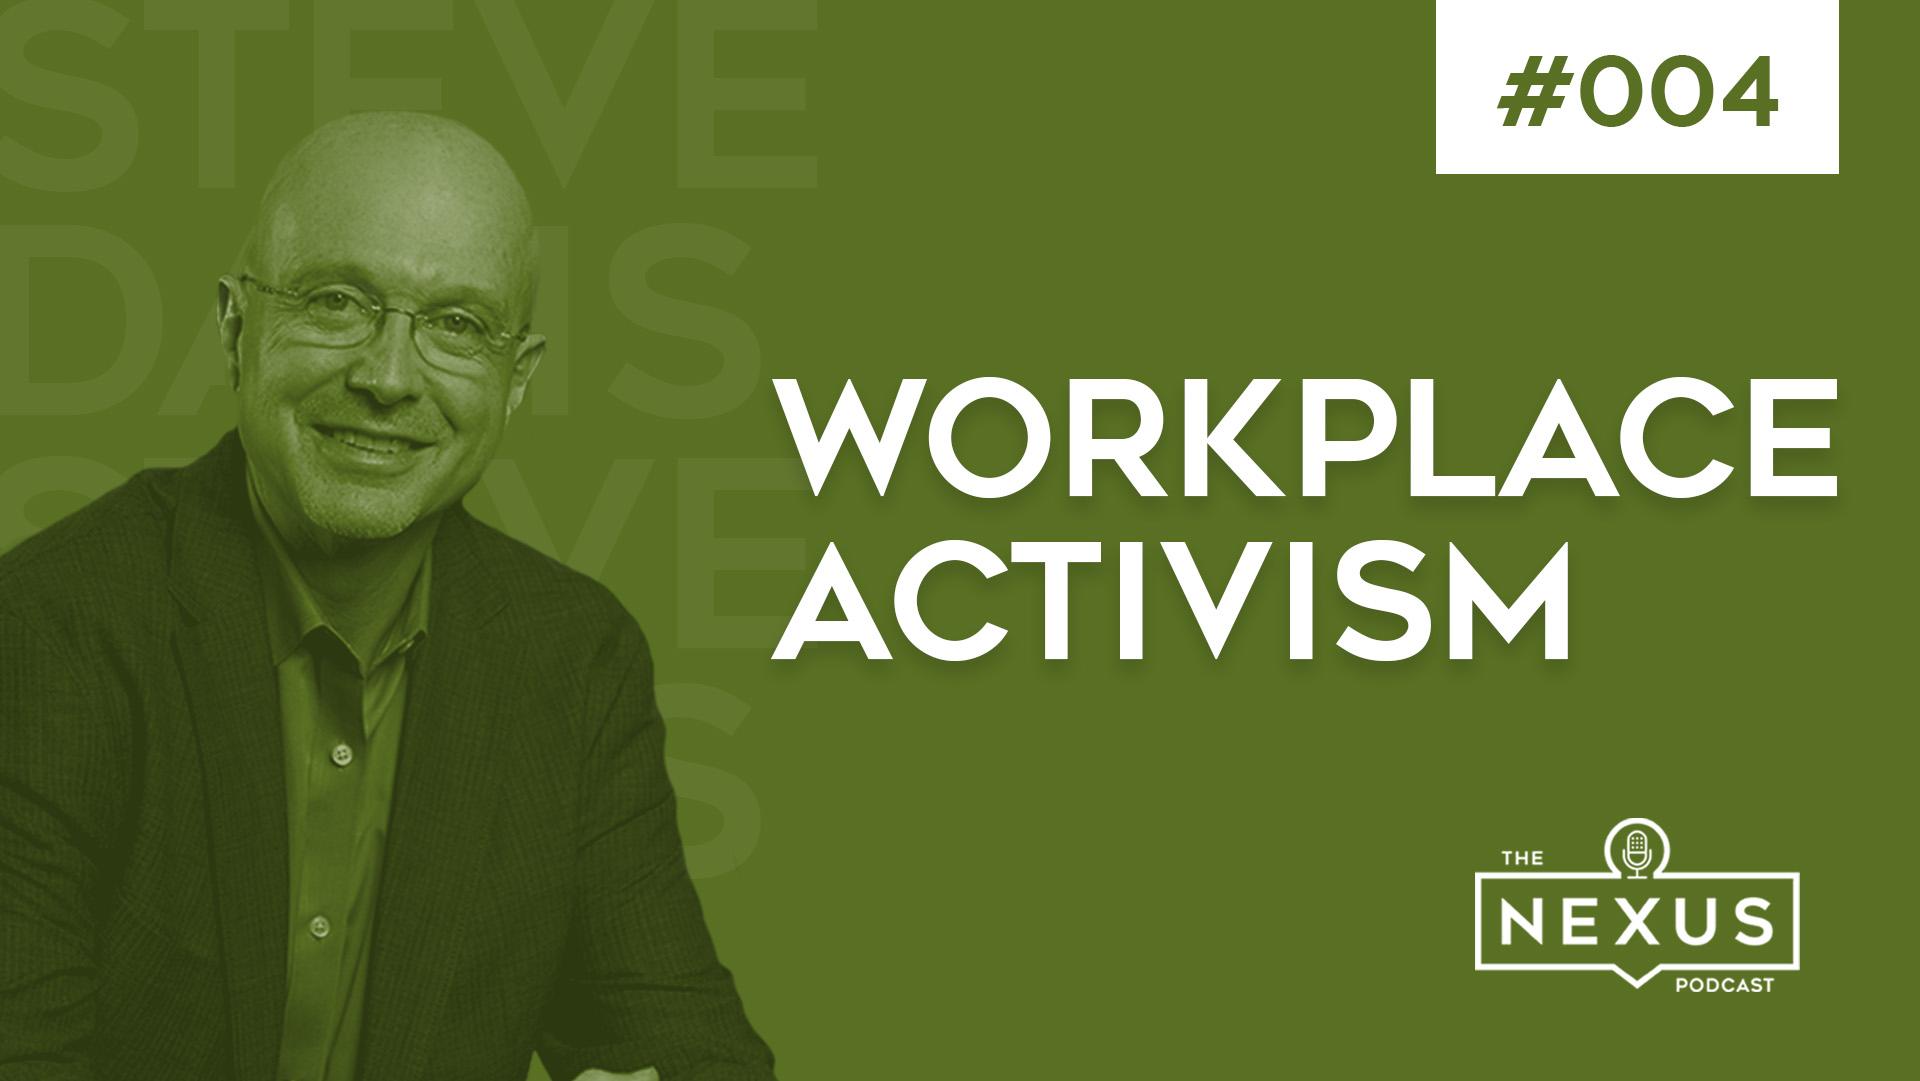 Workplace Activism with Steve Davis